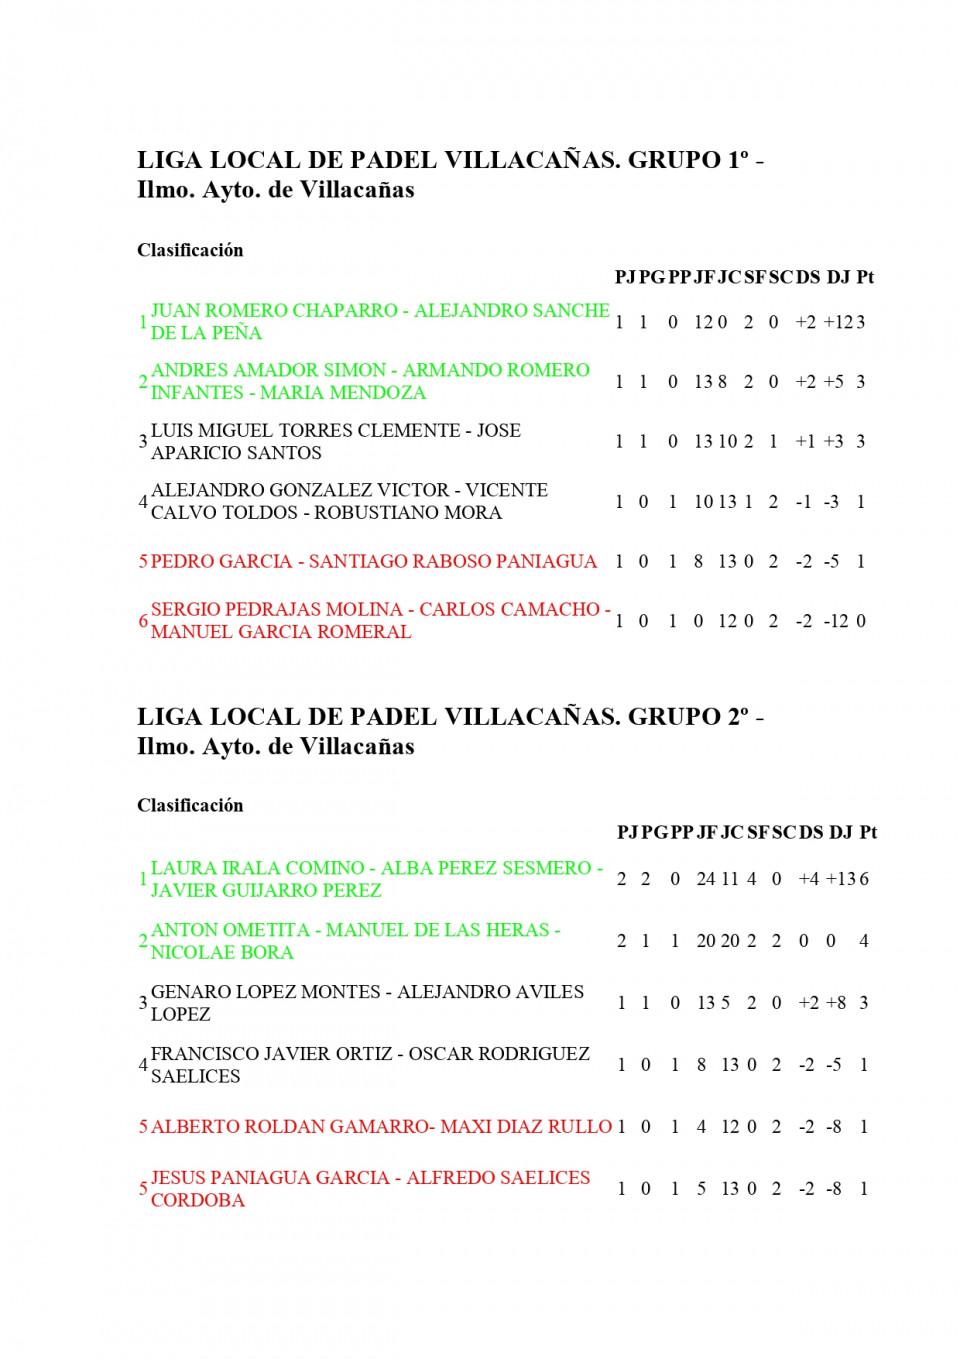 Clasificaciones Primera Jornada Liga Local de Padel